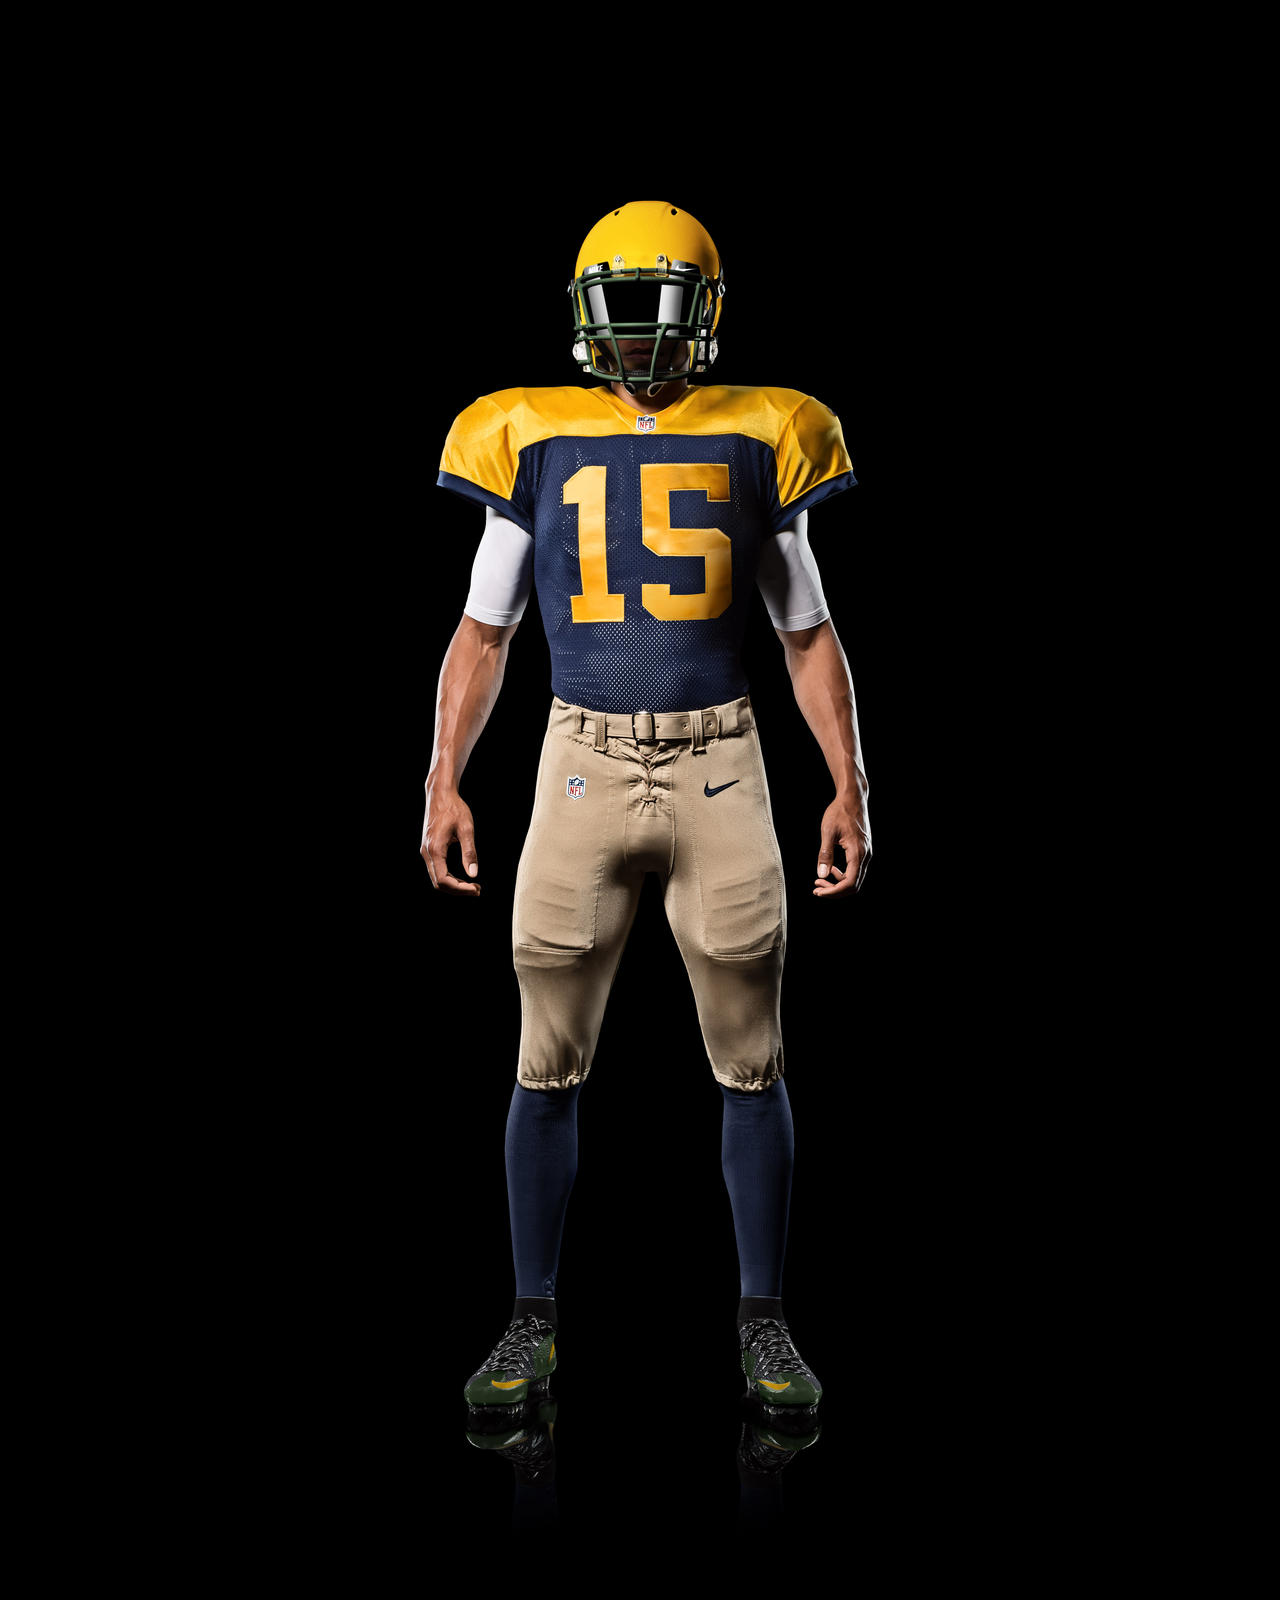 Faded Football Uniforms